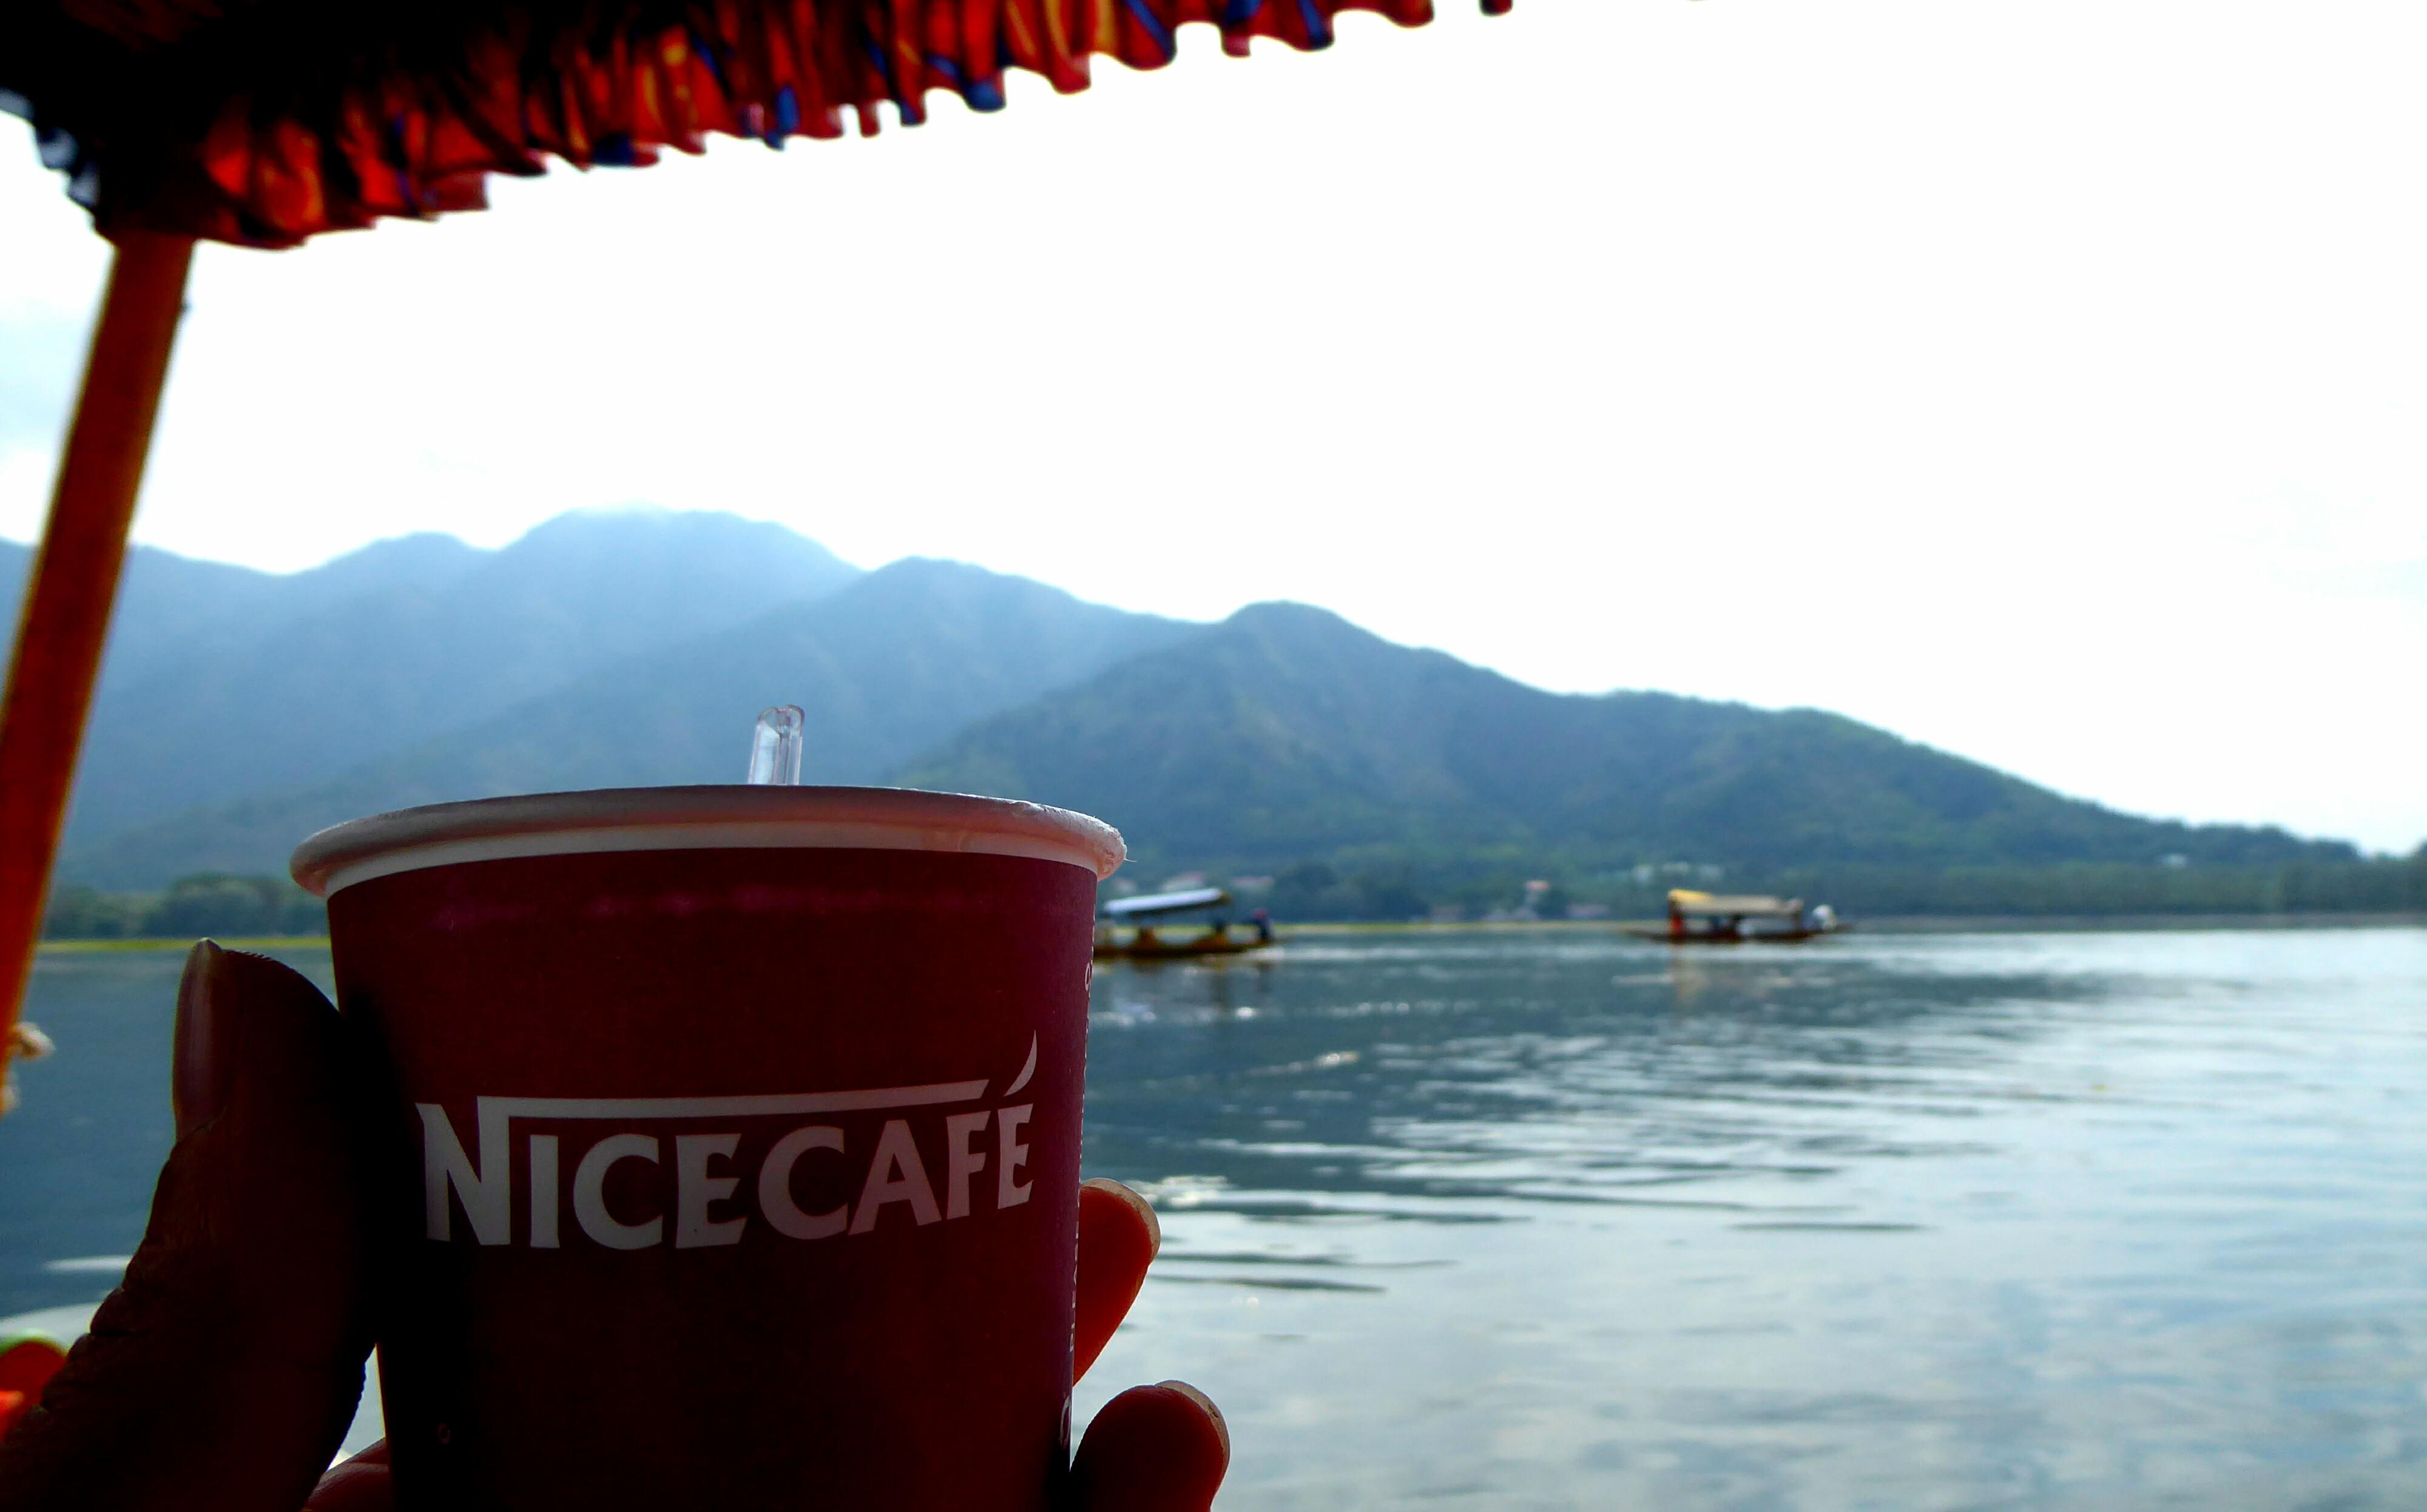 Chai op het Dal meer, Srinagar